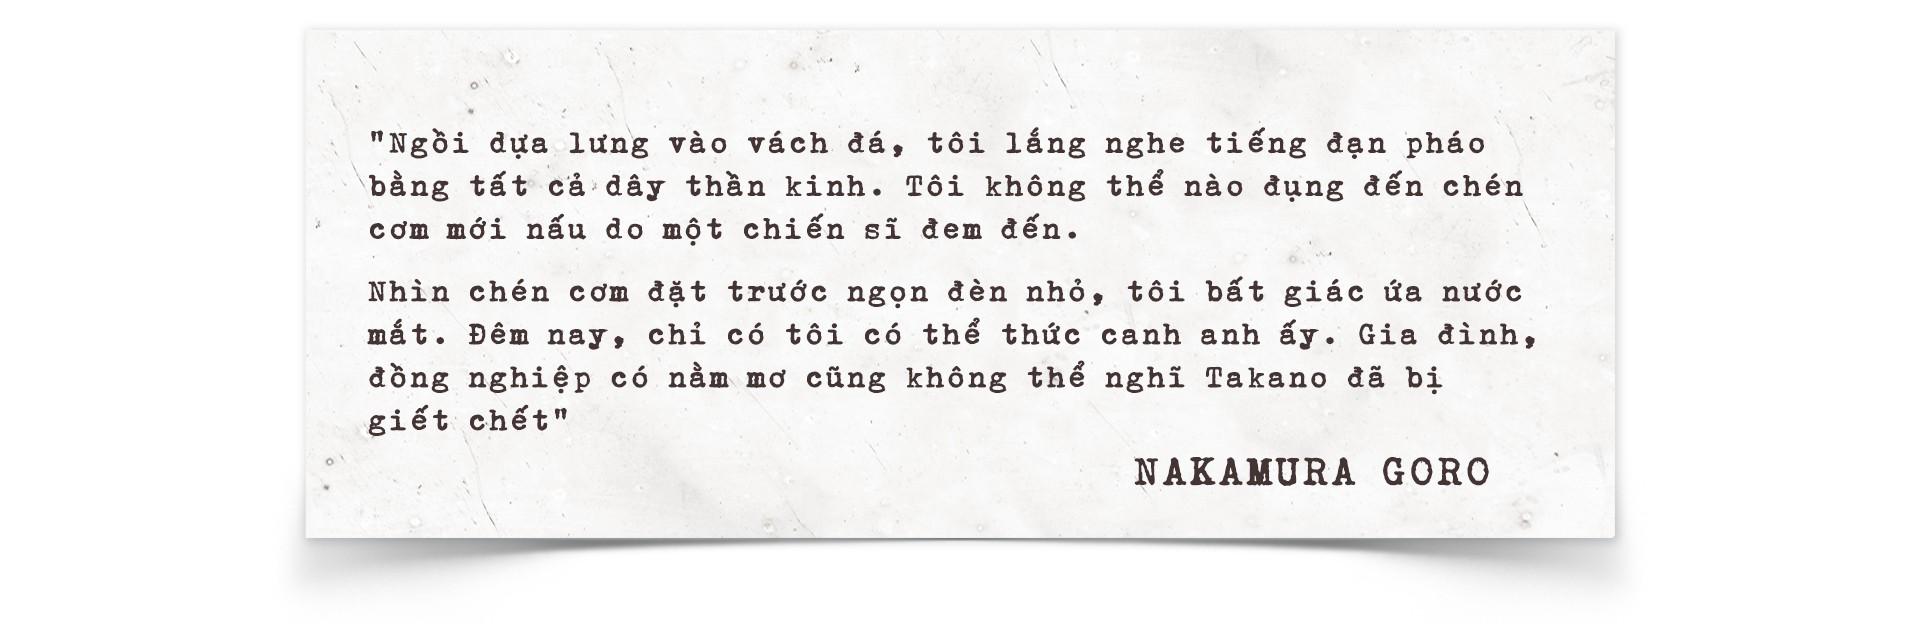 Kỳ 3: Cái chết của Takano - Ảnh 5.